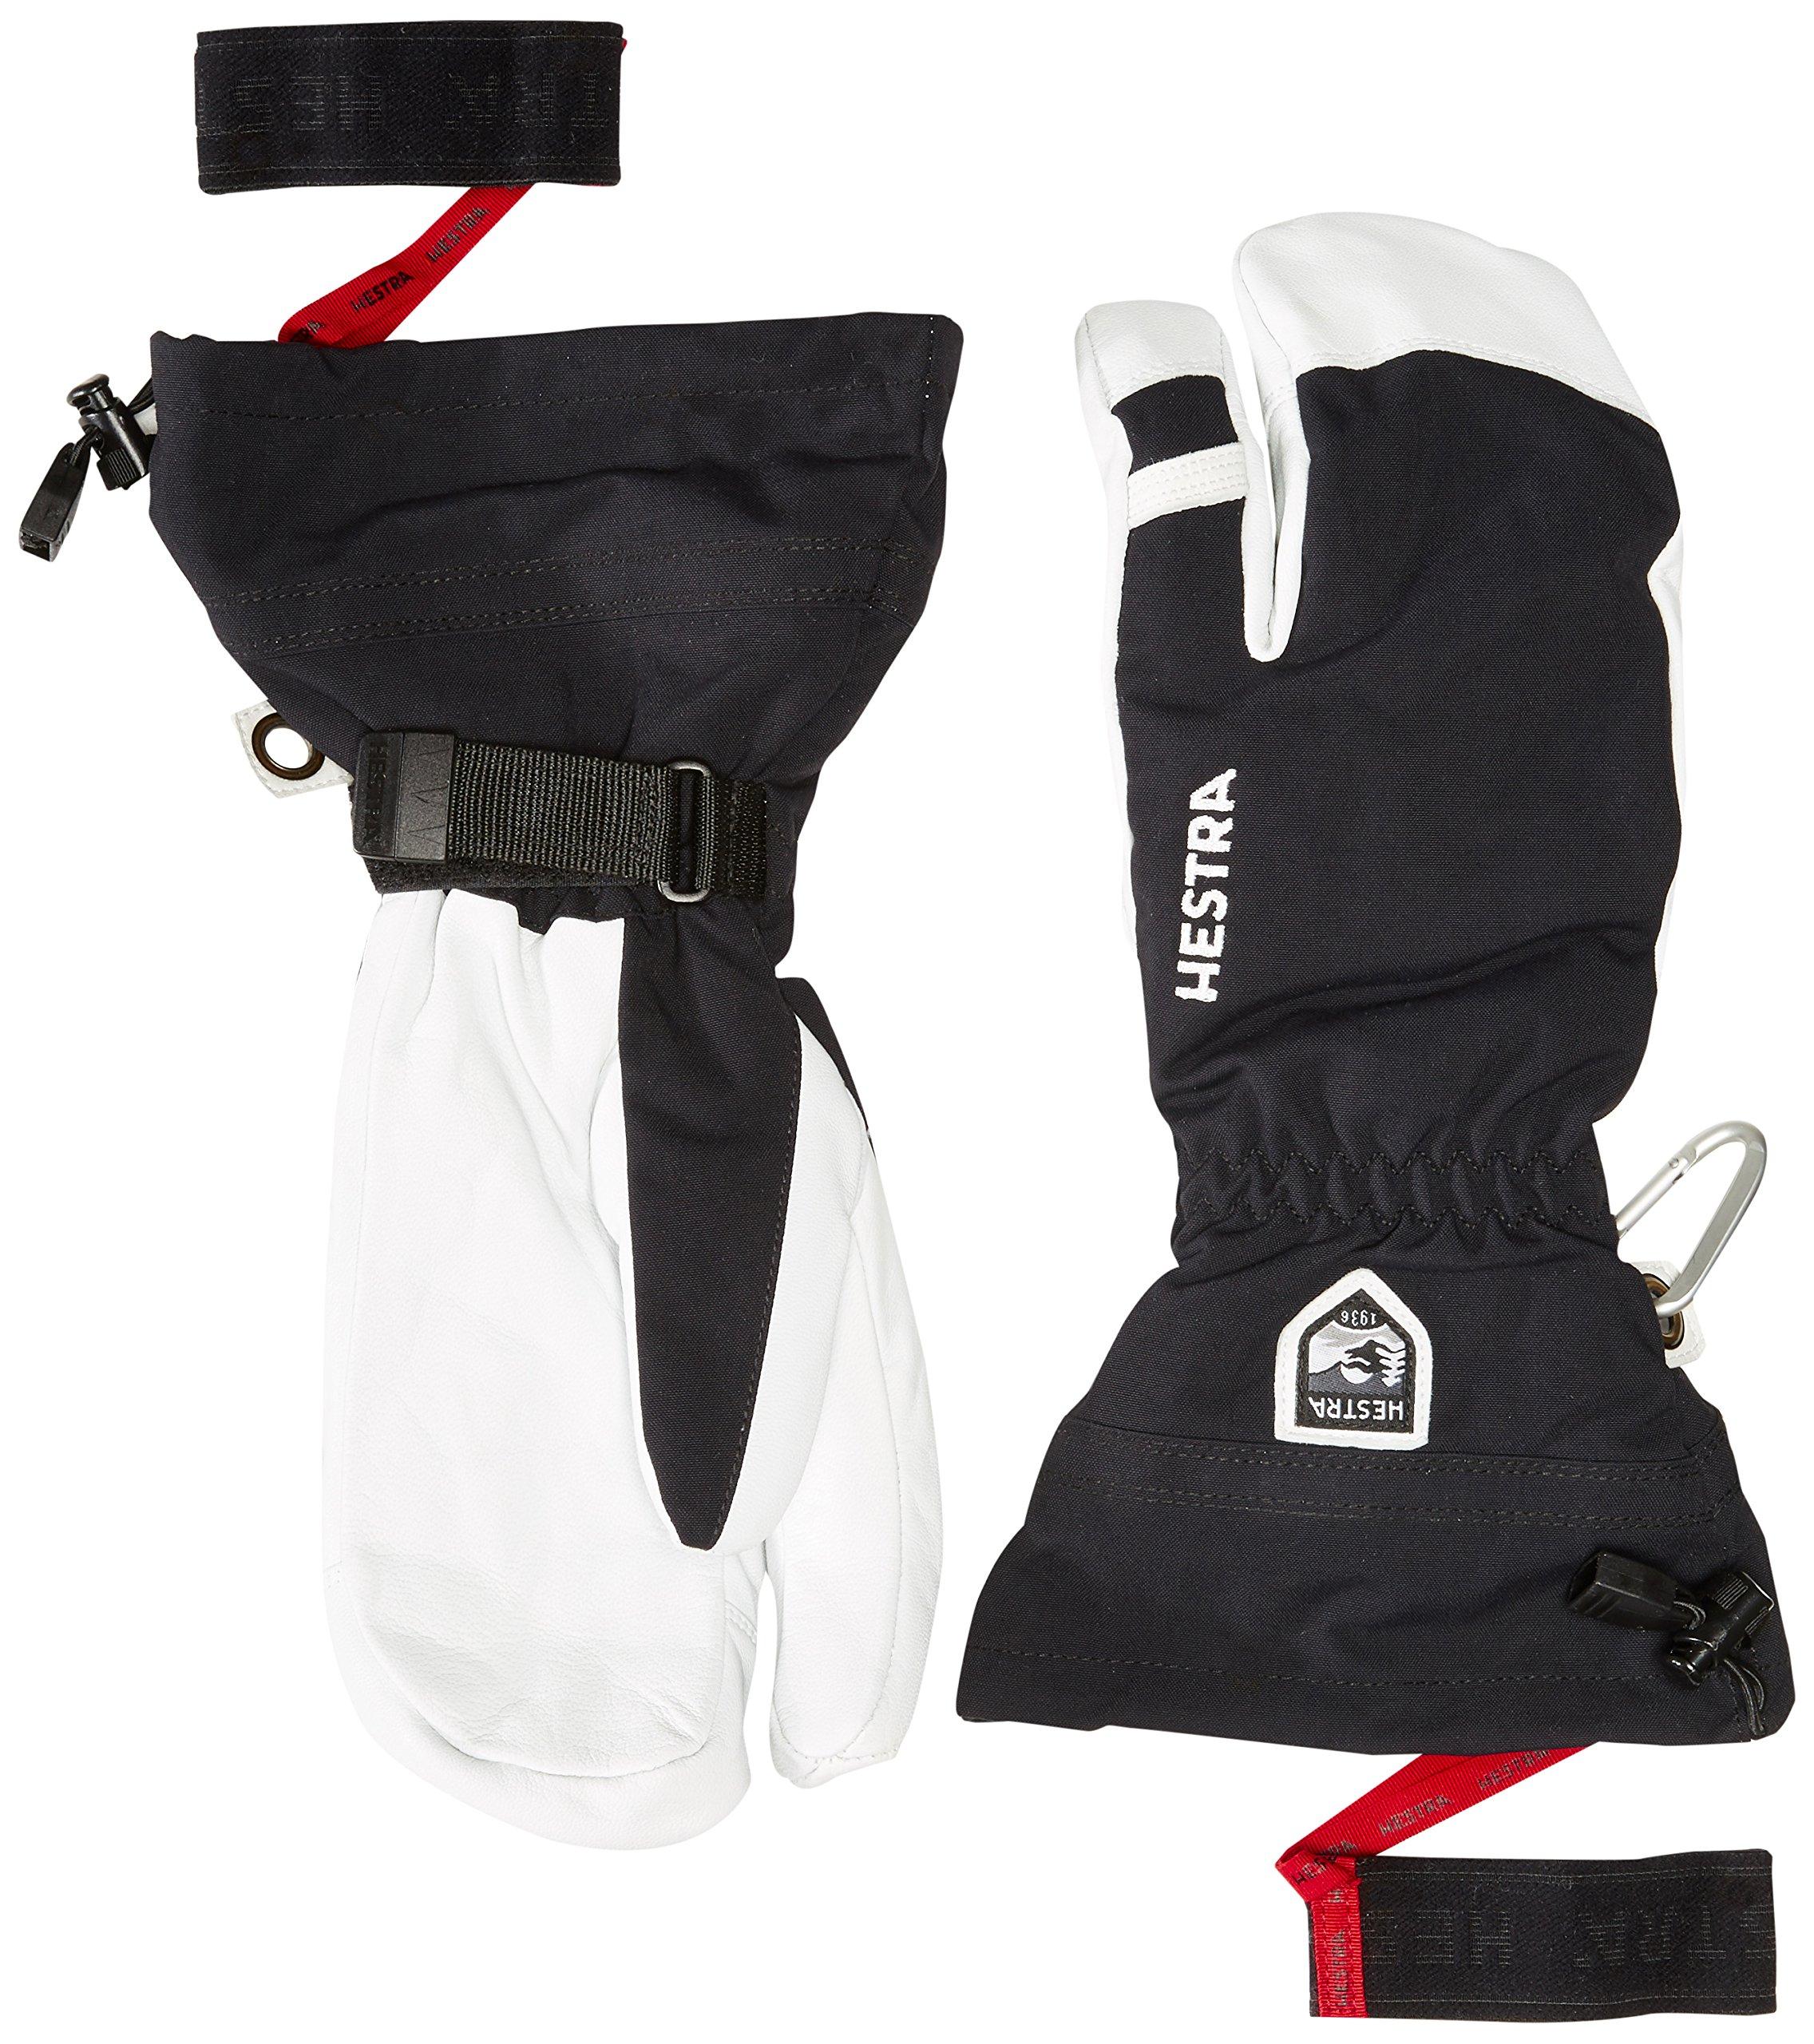 Hestra Heli Ski 3-Finger Glove, Black, 10 by Hestra (Image #1)